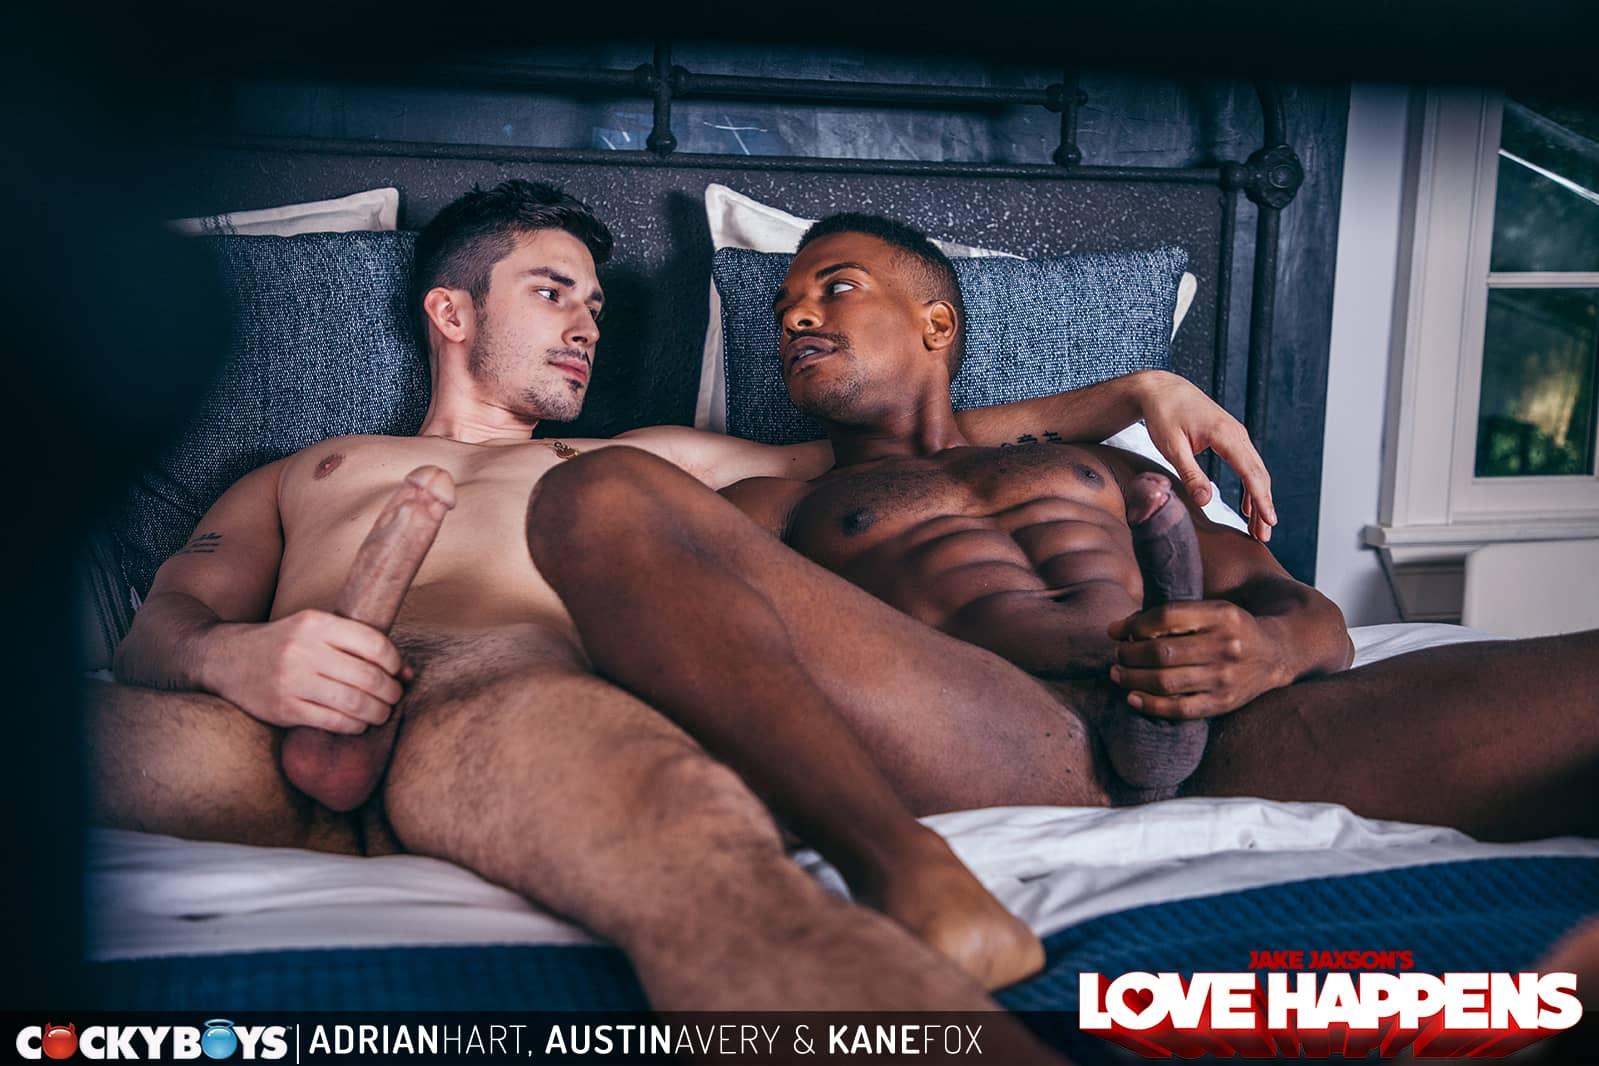 Love Happens – Austin Avery, Kane Fox and Adrian Hart